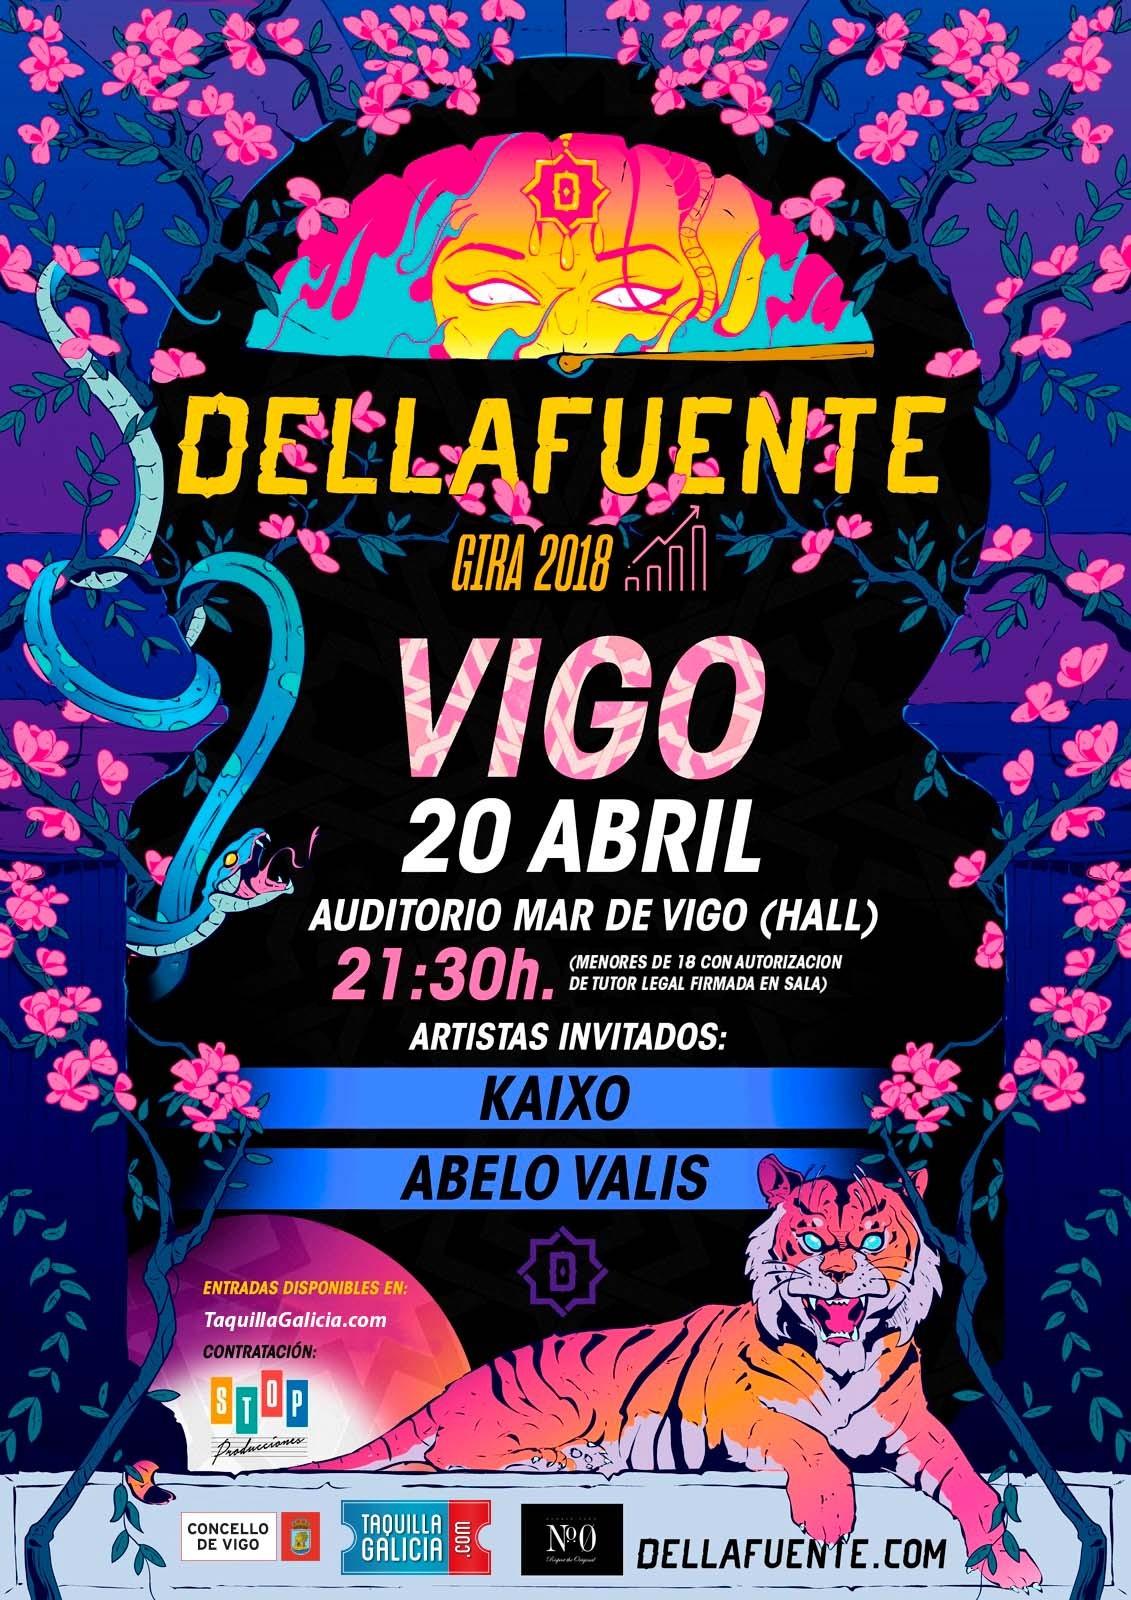 DELLAFUENTE + KAIXO + ABELO VALIS (Vigo)